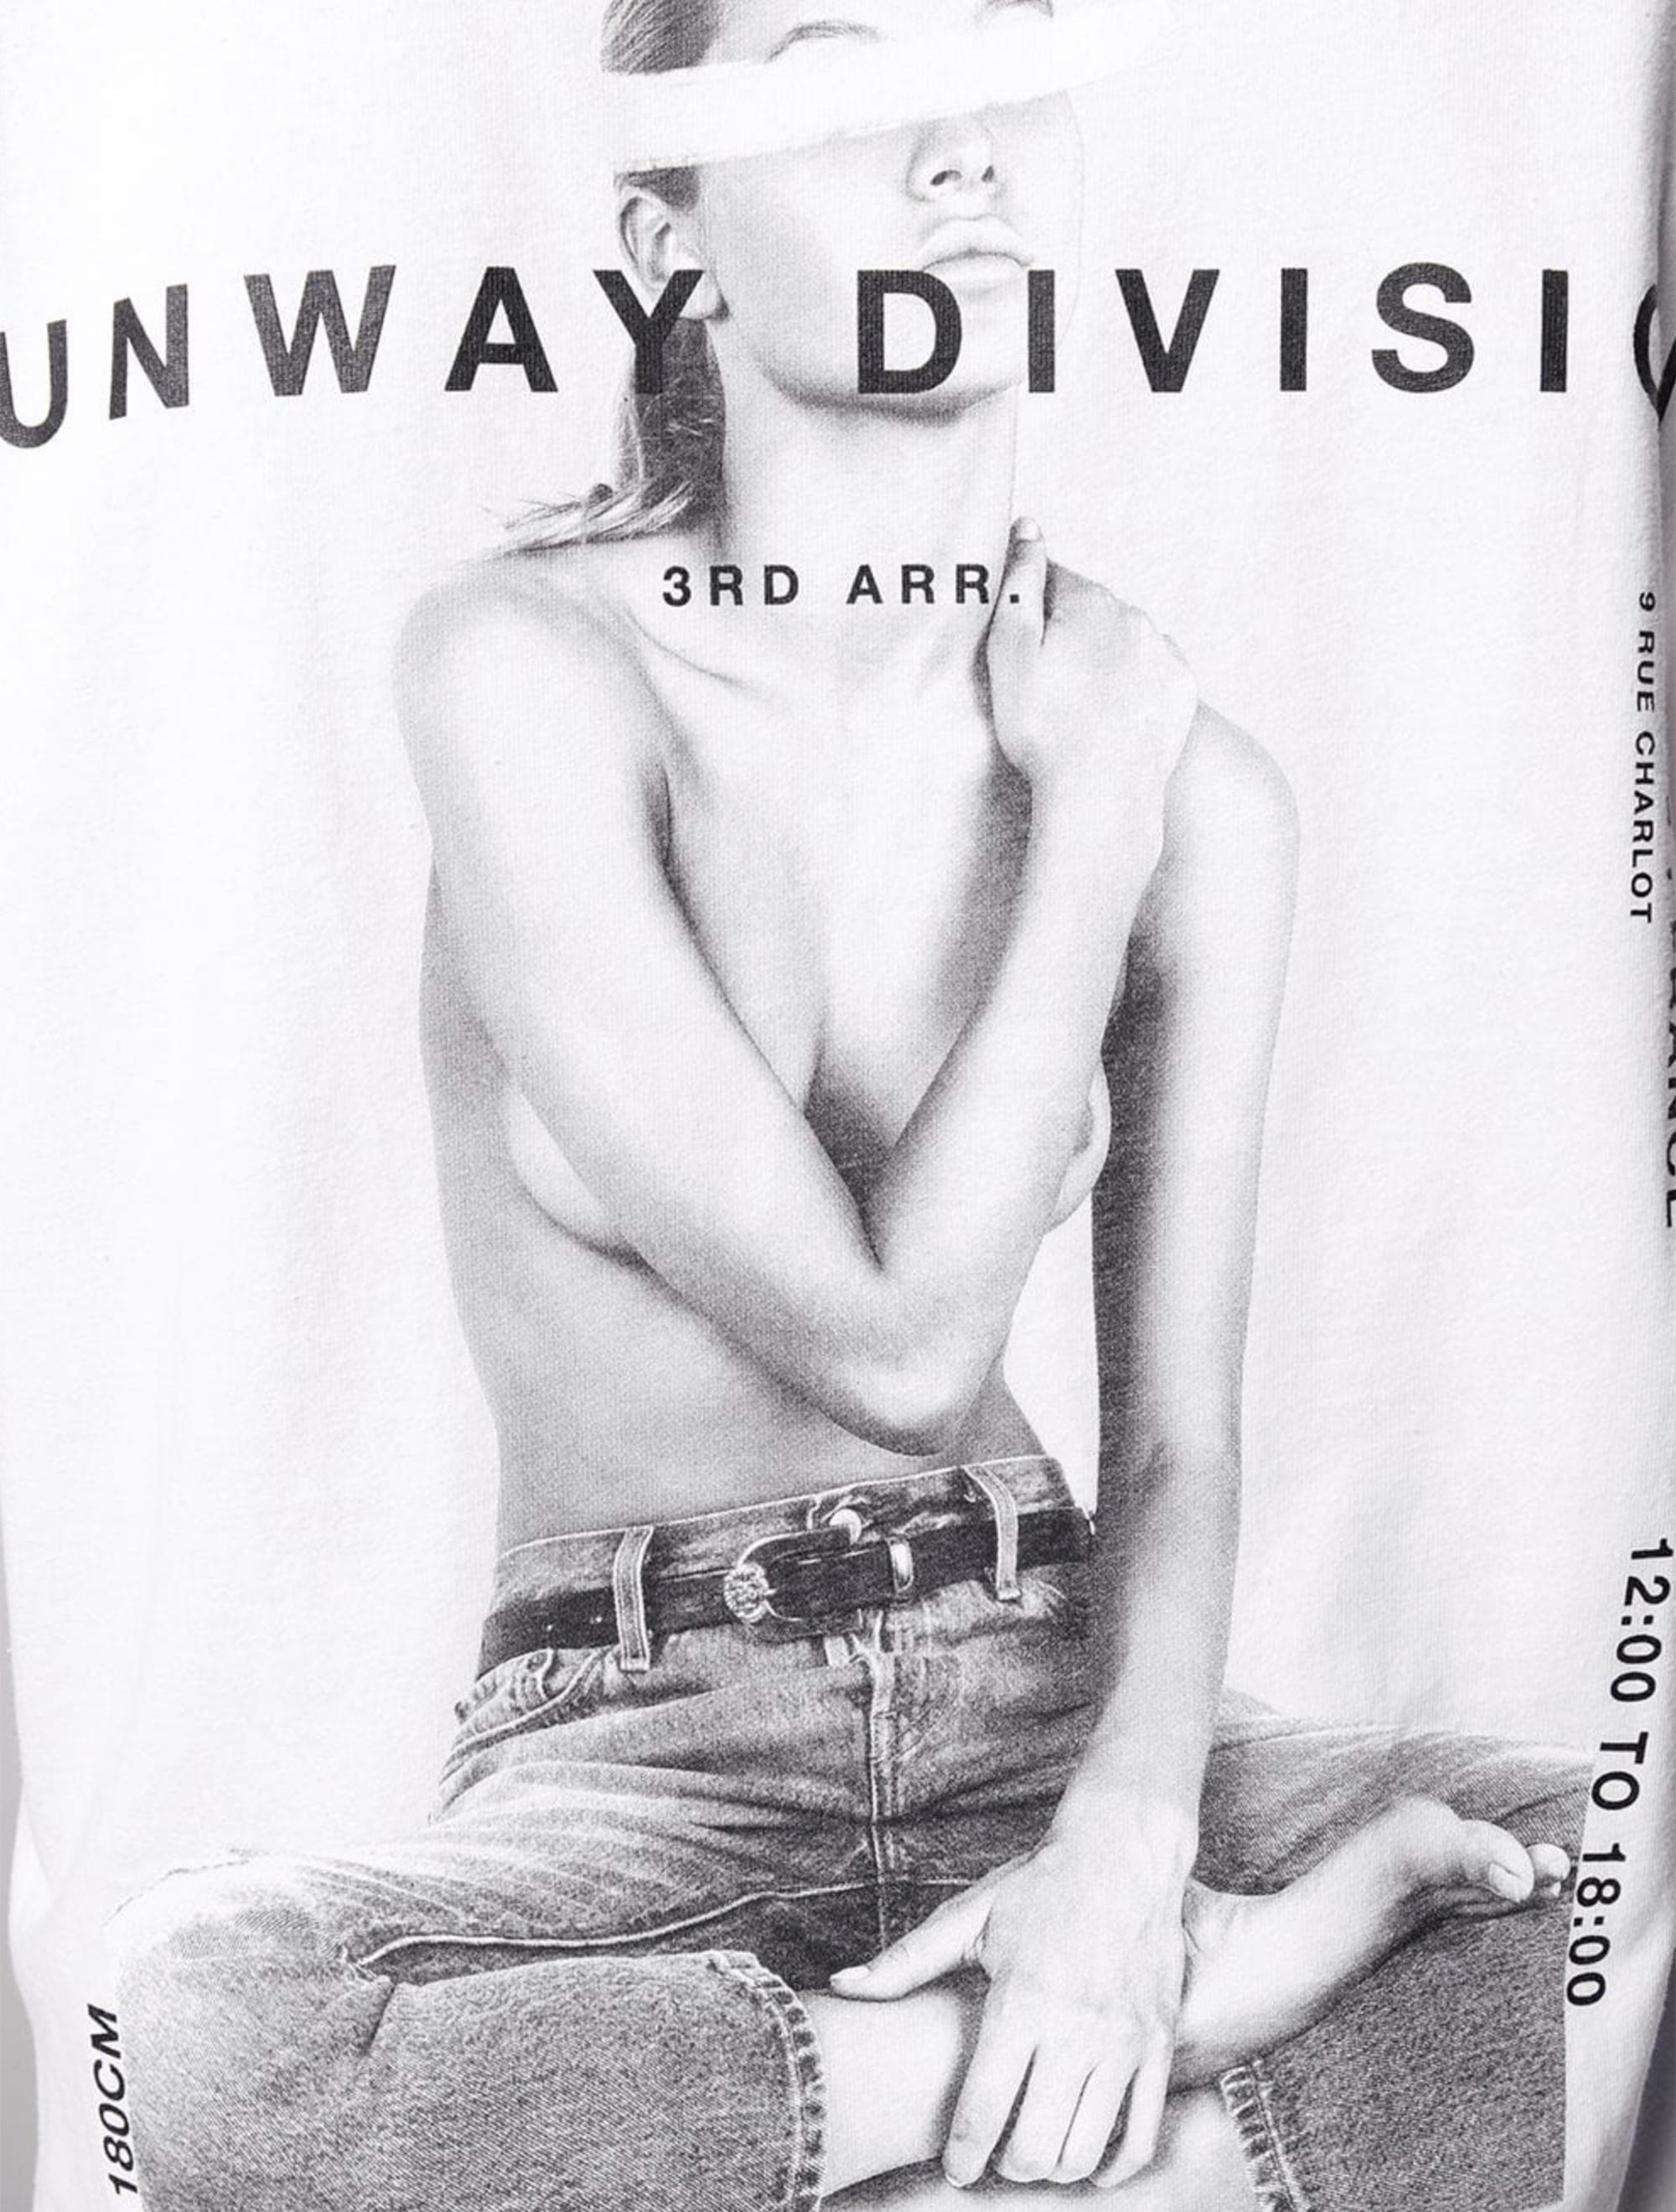 Picture of Ih Nom Uh Nit   Runway Division Print T-Shirt